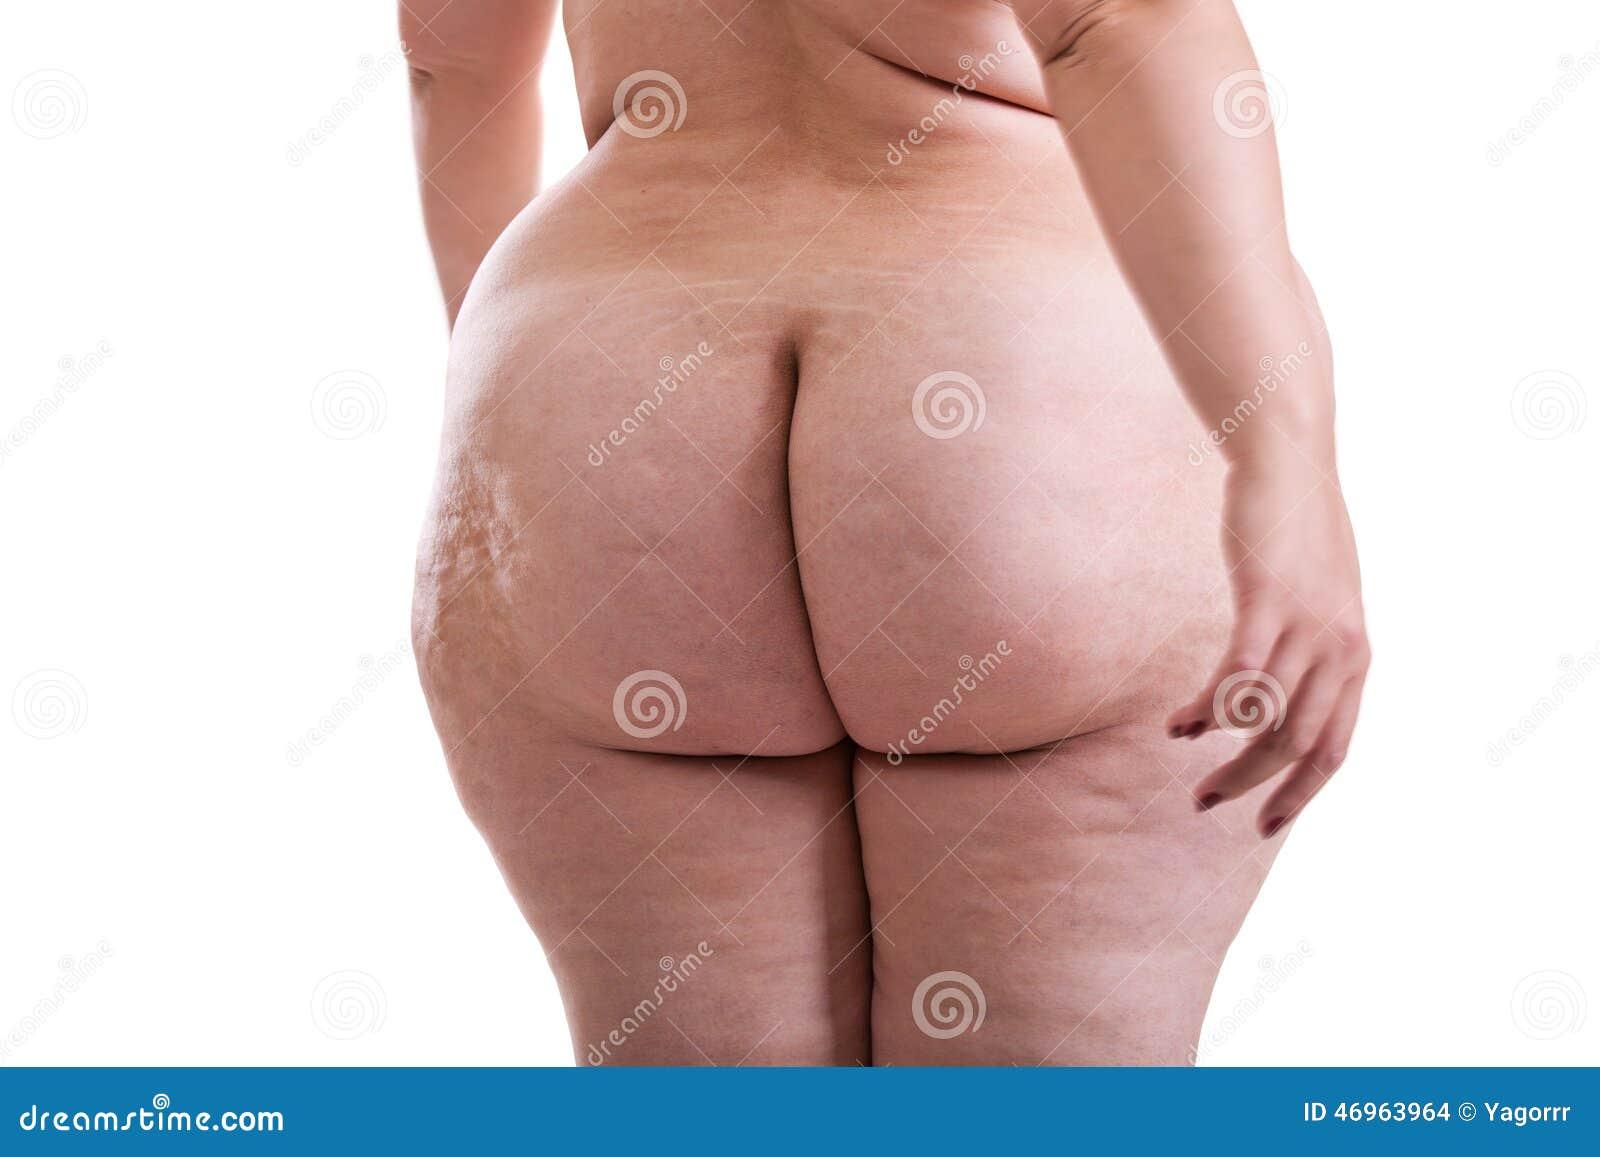 female sex naked gif